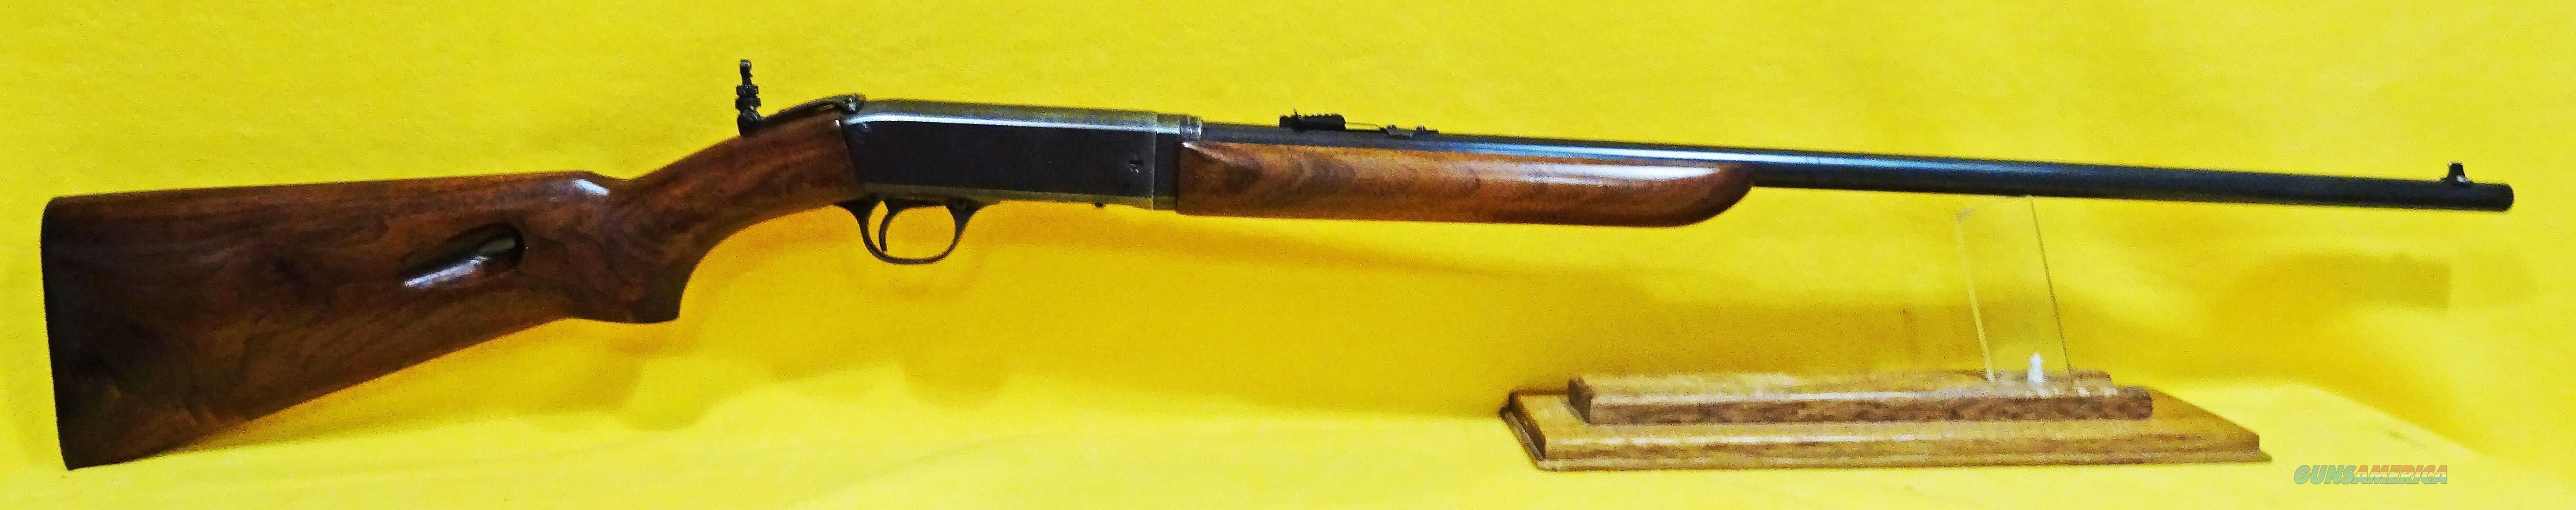 REMINGTON 241  Guns > Rifles > Remington Rifles - Modern > .22 Rimfire Models